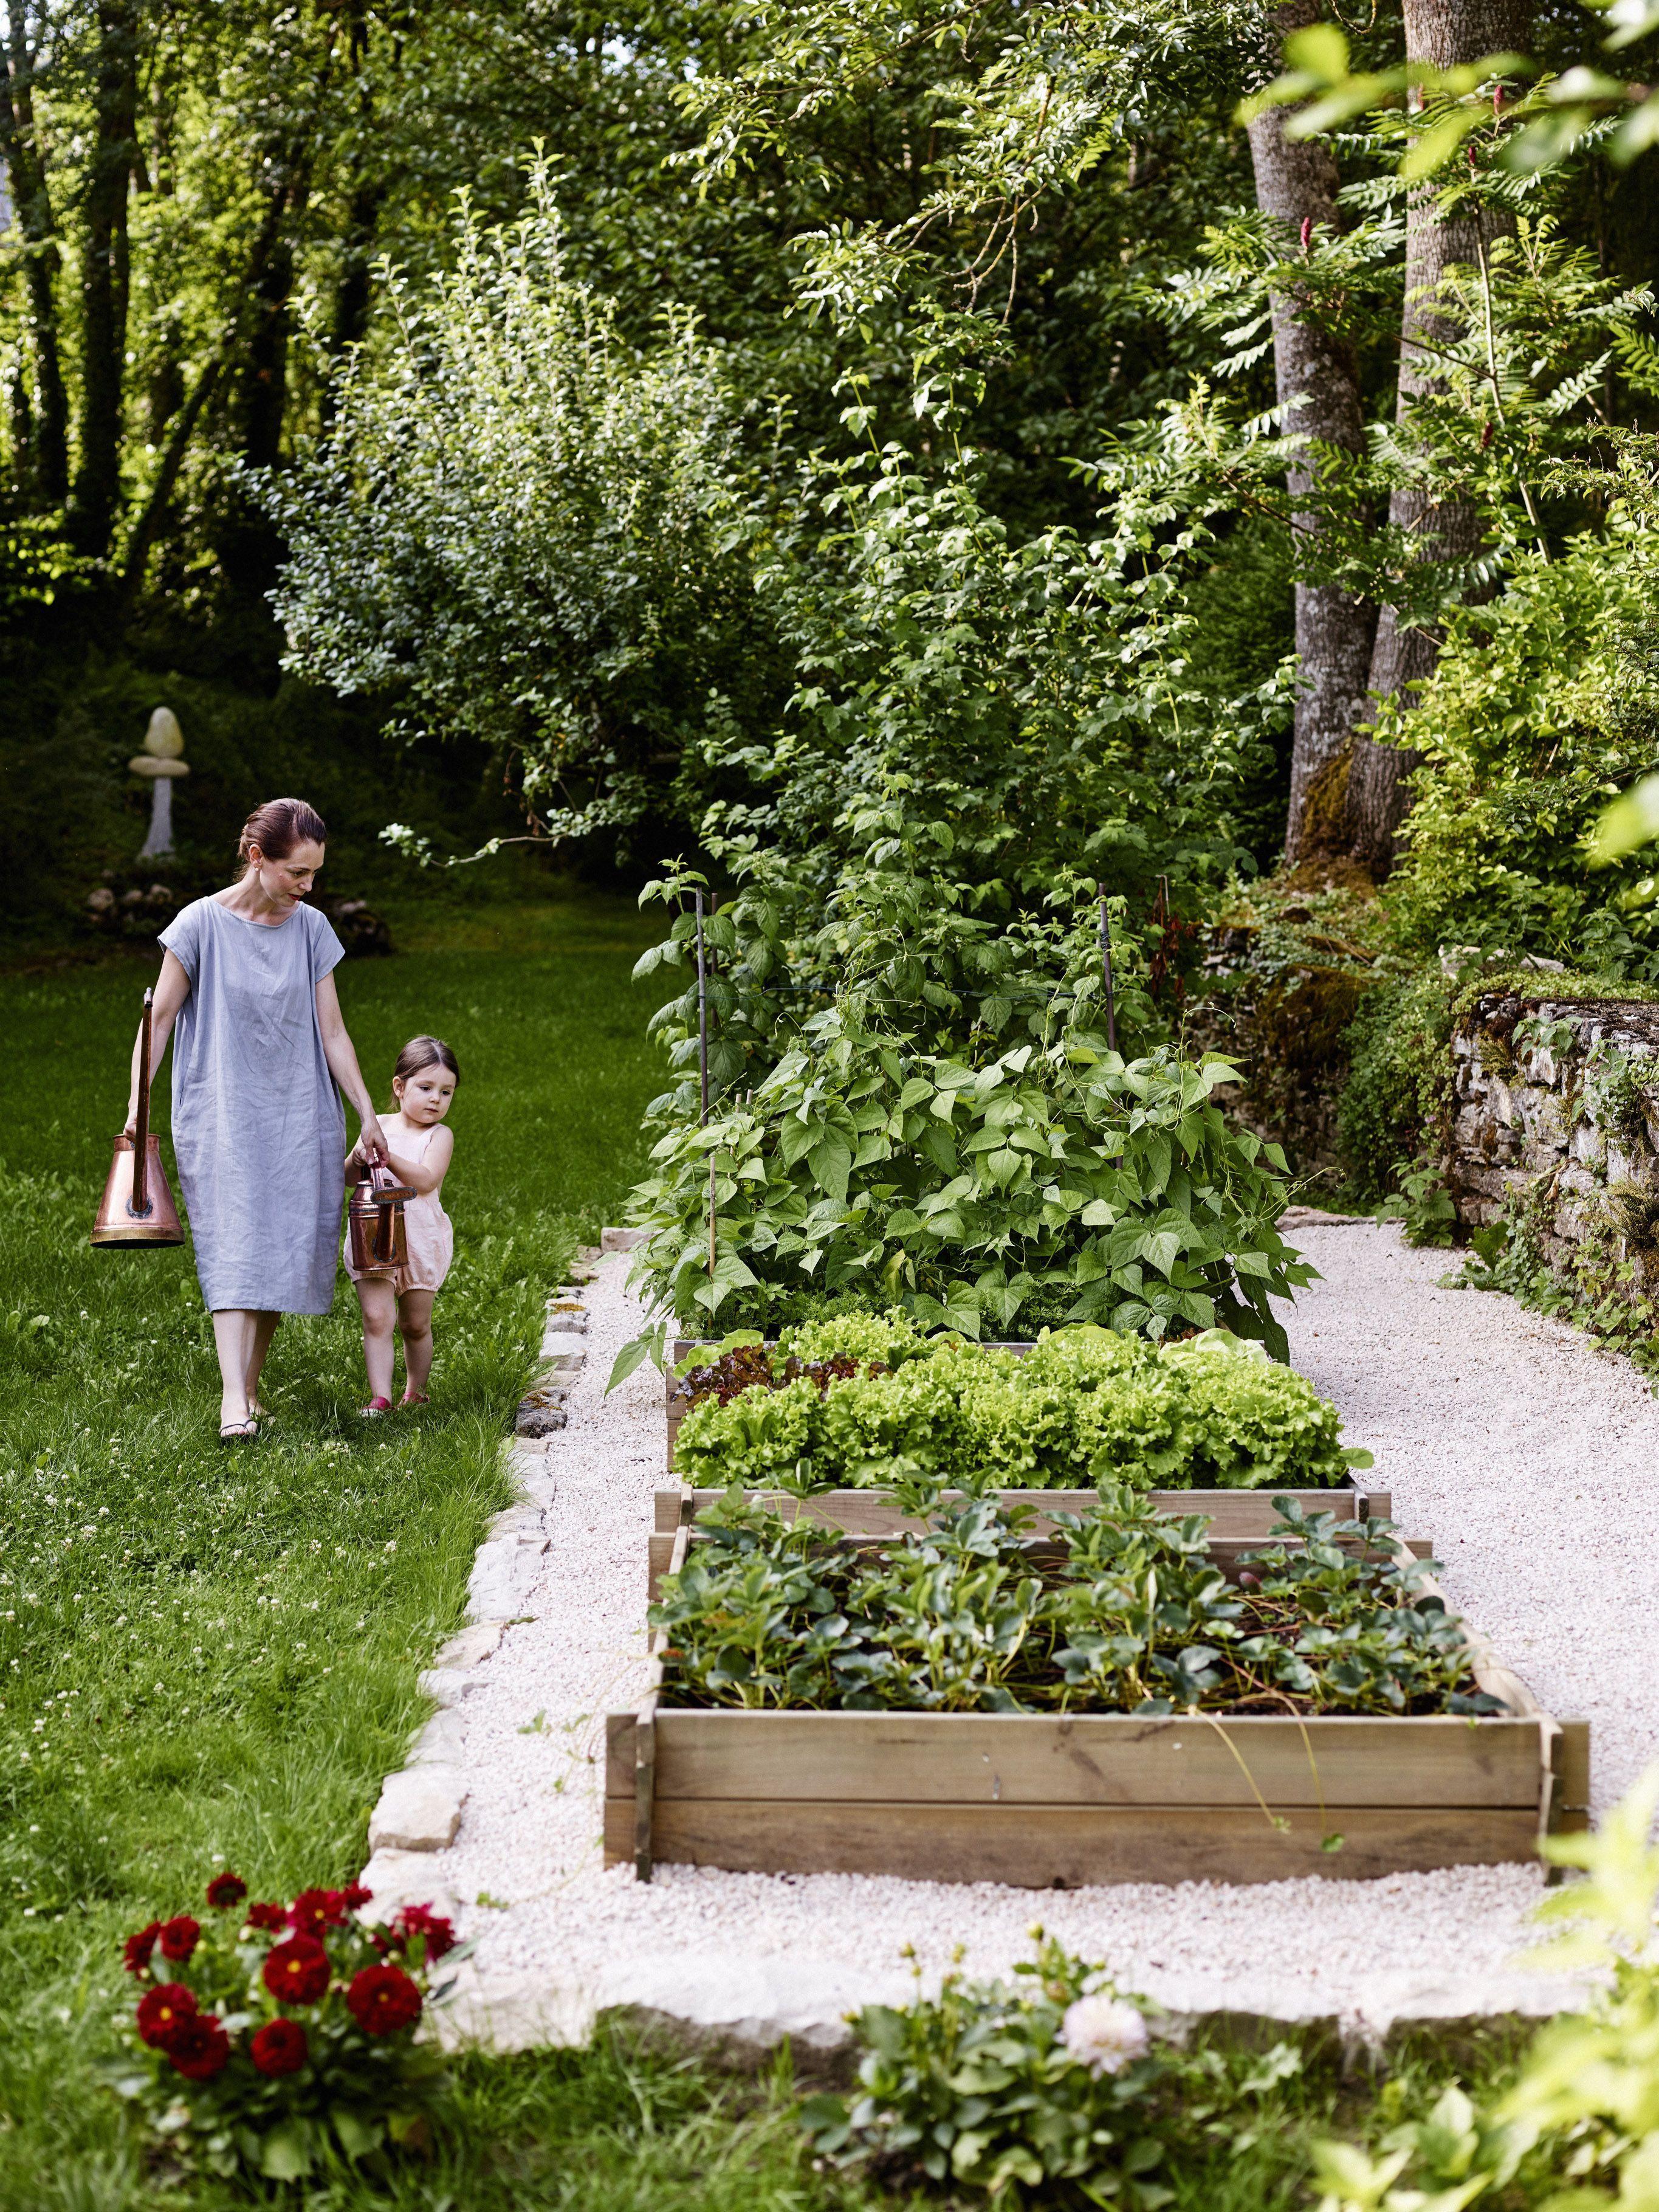 the cook s atelier kitchen garden in burgundy france image by anson smart thecooksatelier on kitchen garden id=96700